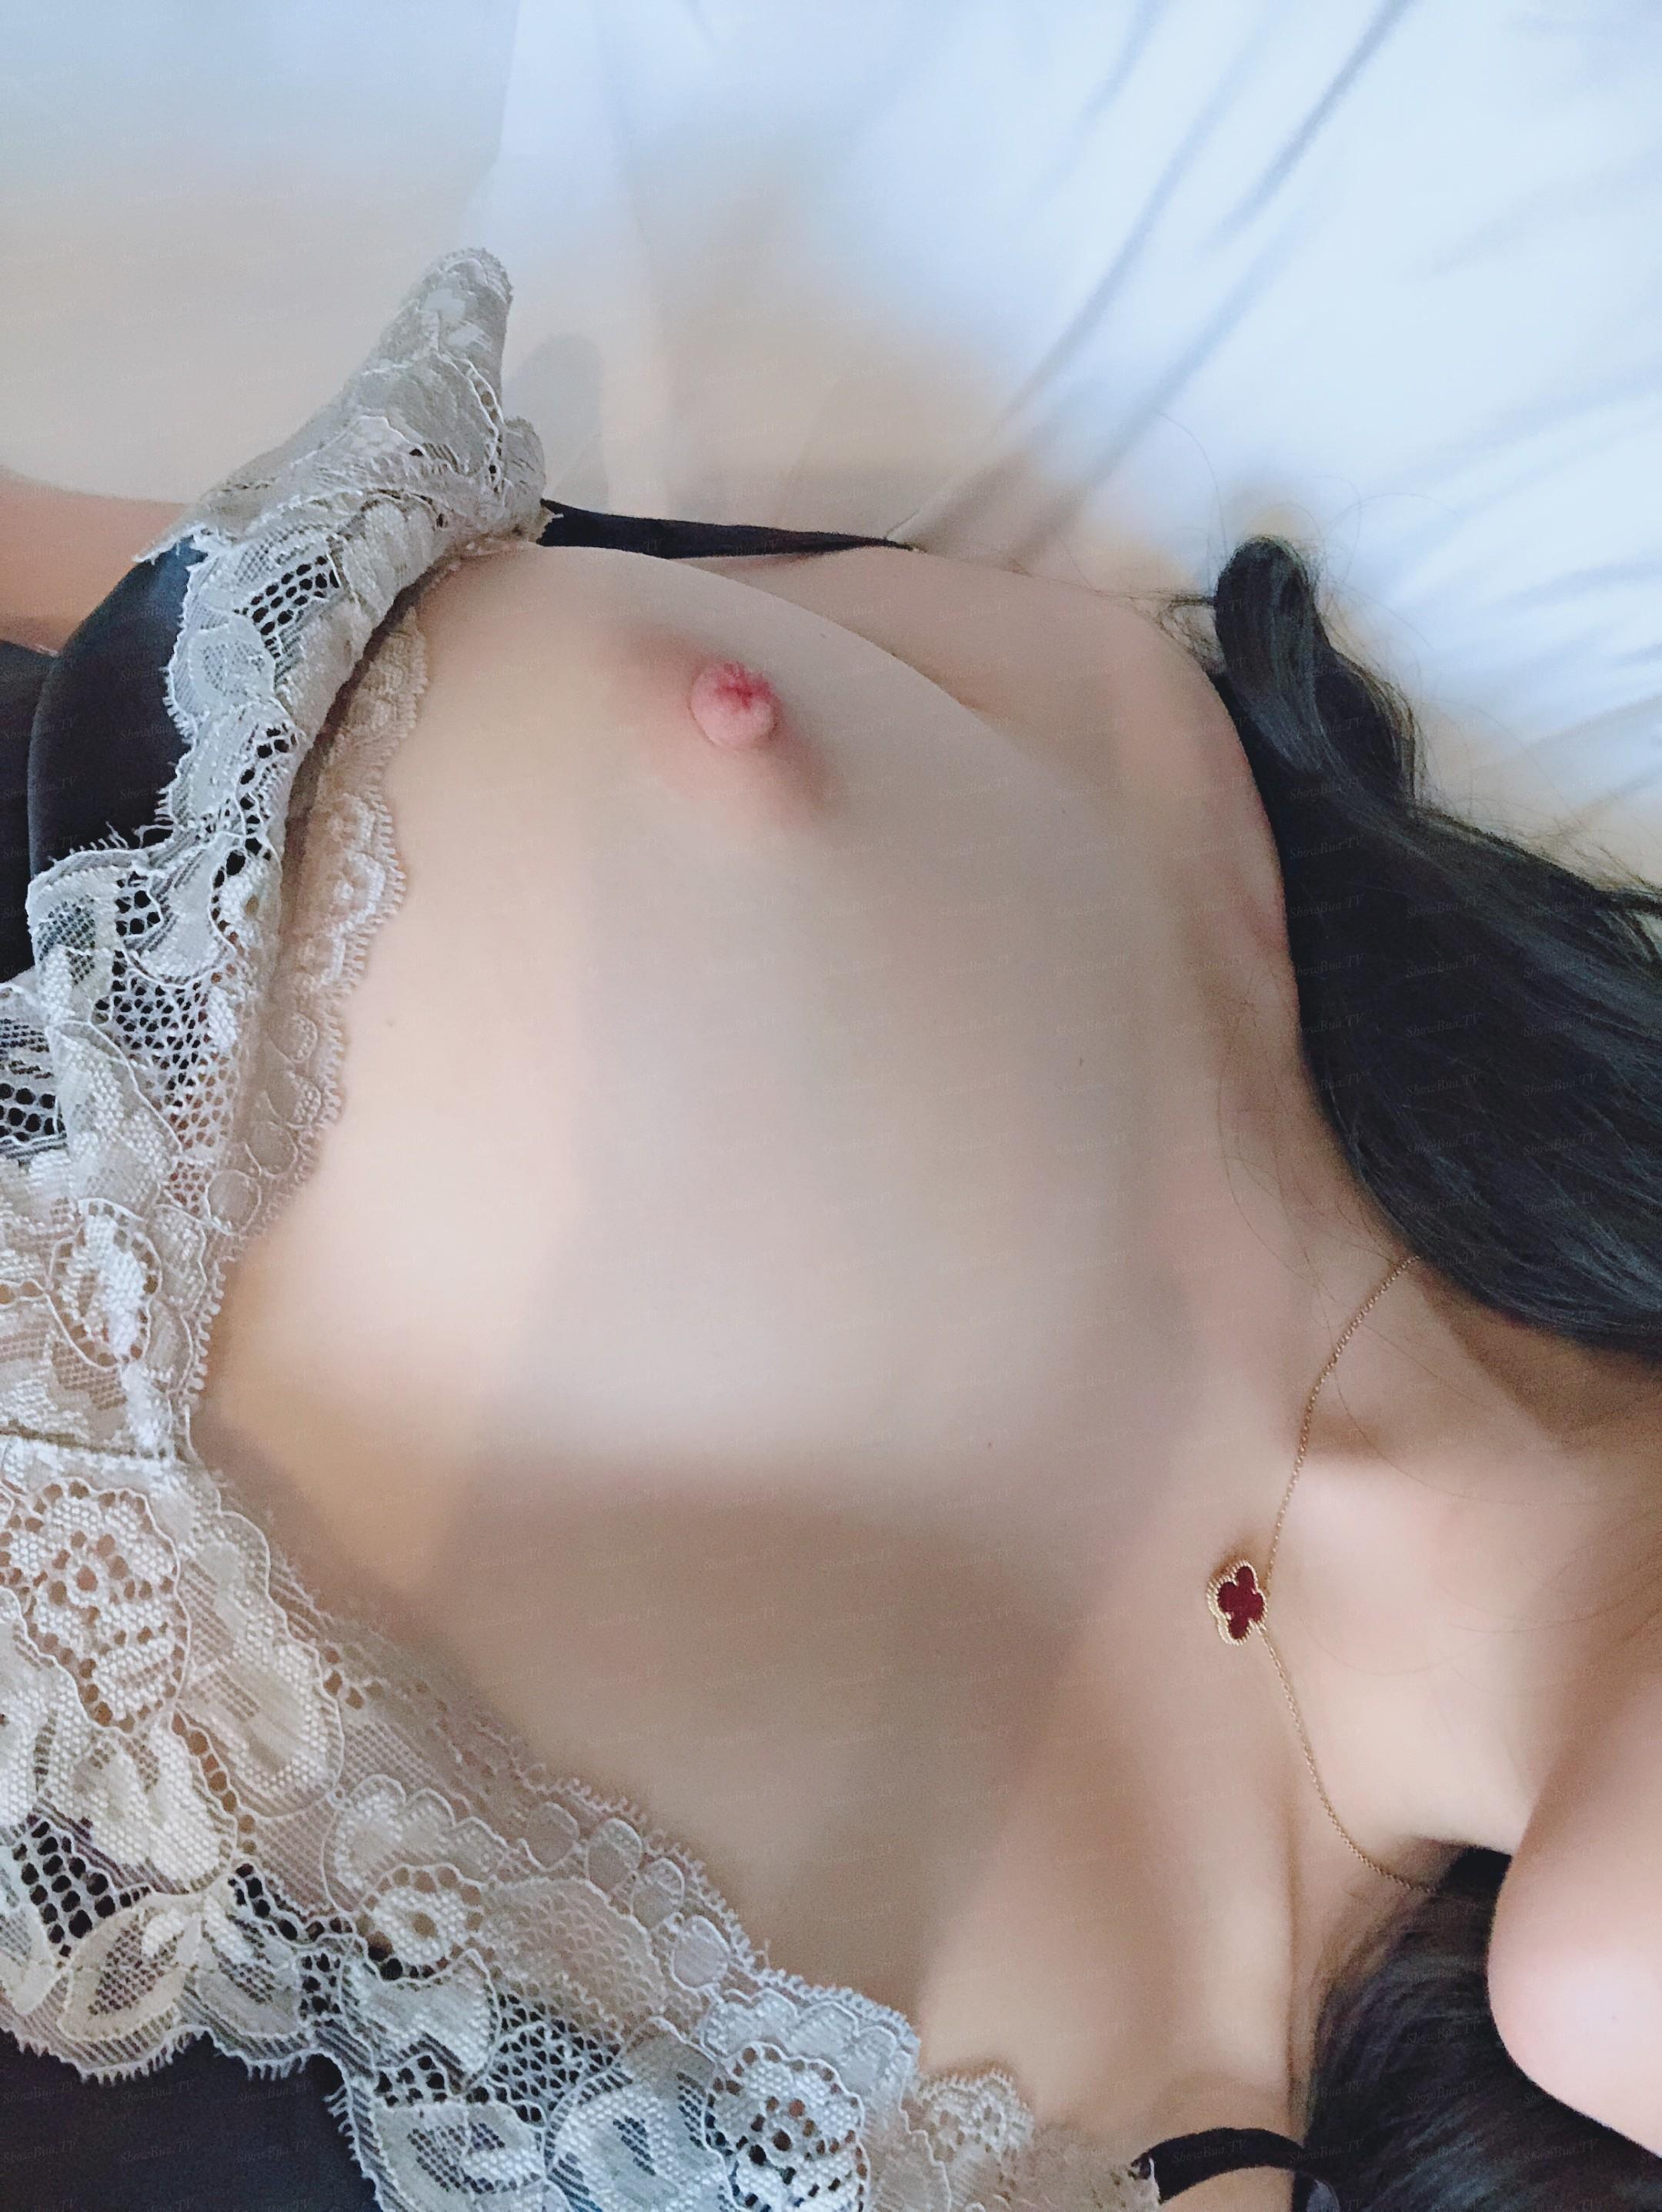 showbuatv-hotgirl-dang-dep-tha-hon-dam-vao-loat-anh-tu-suong-kich-thich-14